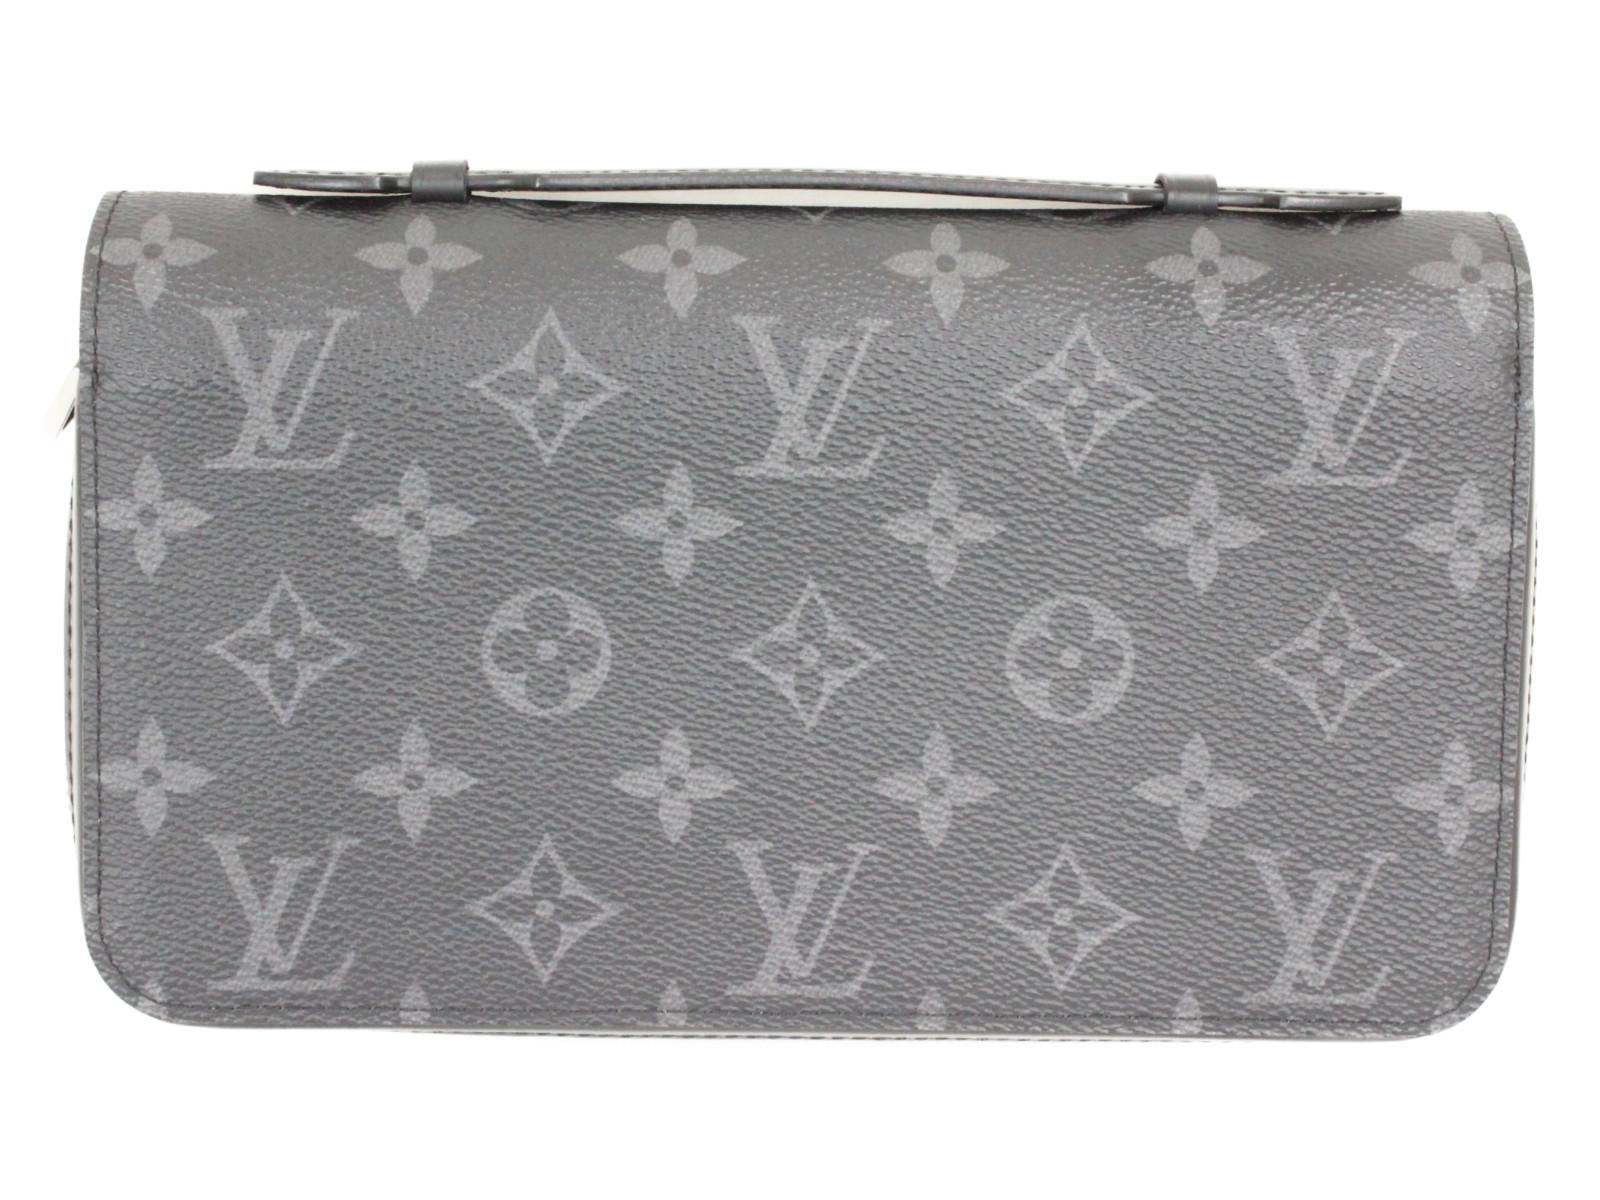 LOUIS VUITTON ルイヴィトンエクリプスジッピーXL M61698財布 大きめ 人気モノグラムエクリプスプレゼント包装可 【中古】